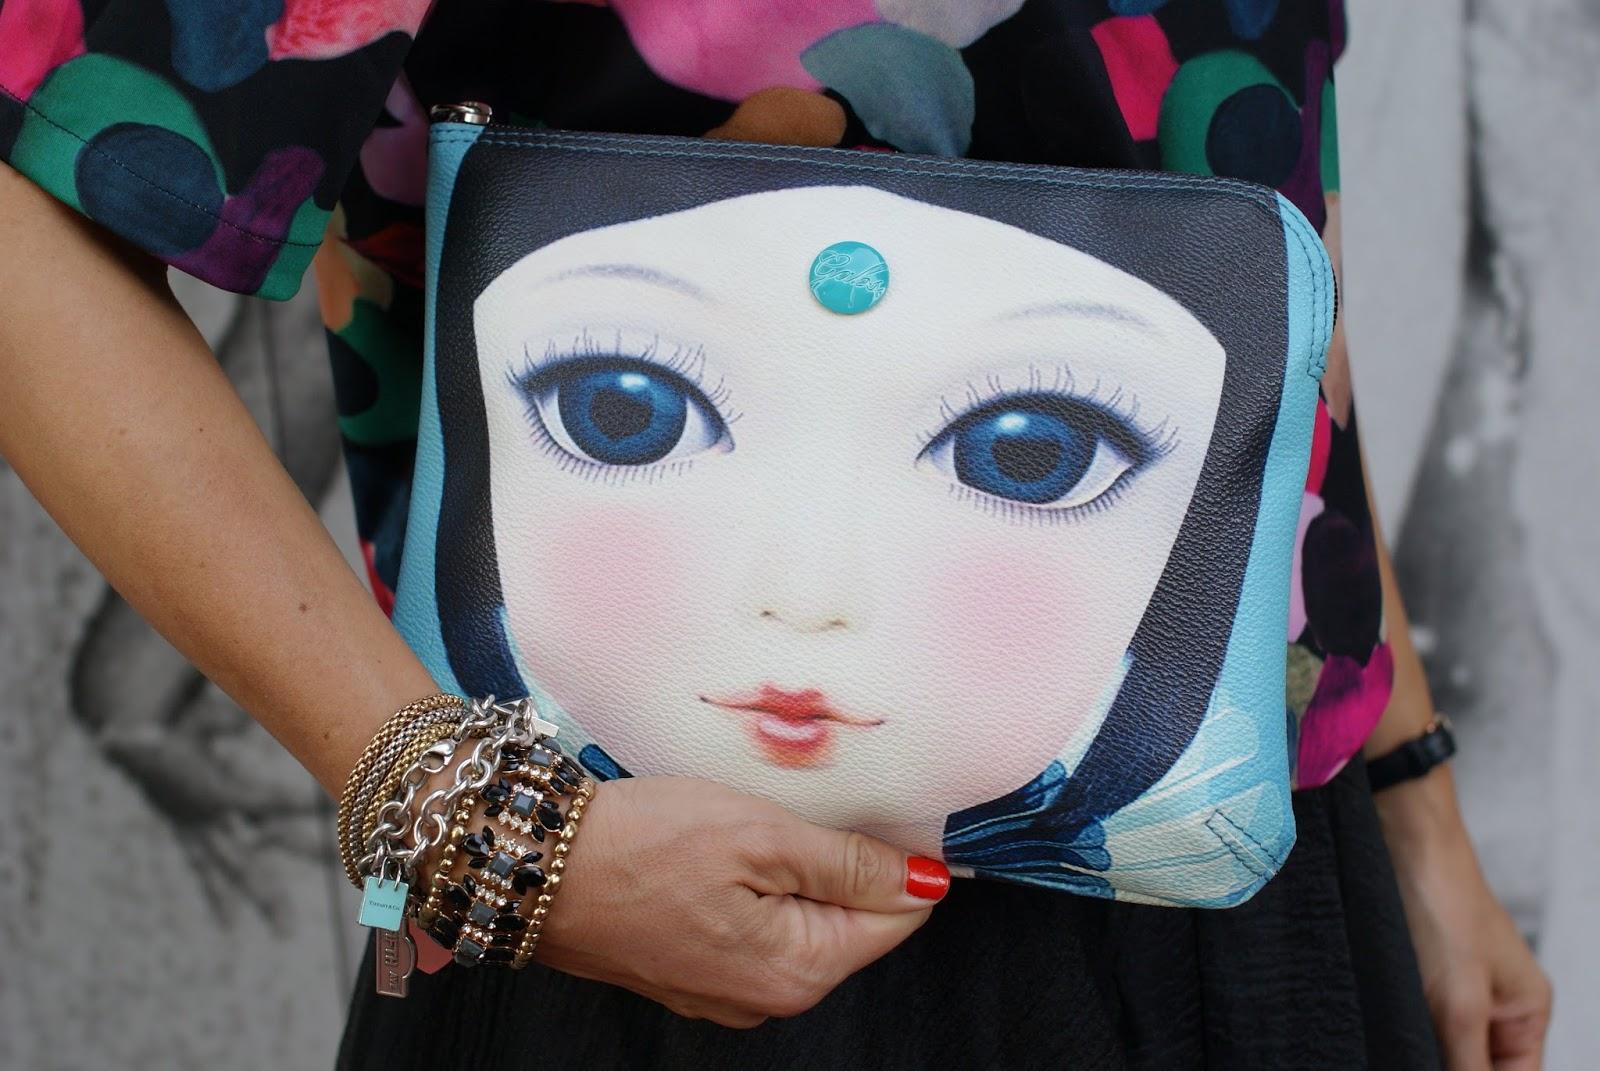 gabs manga clutch on Fashion and Cookies fashion blog